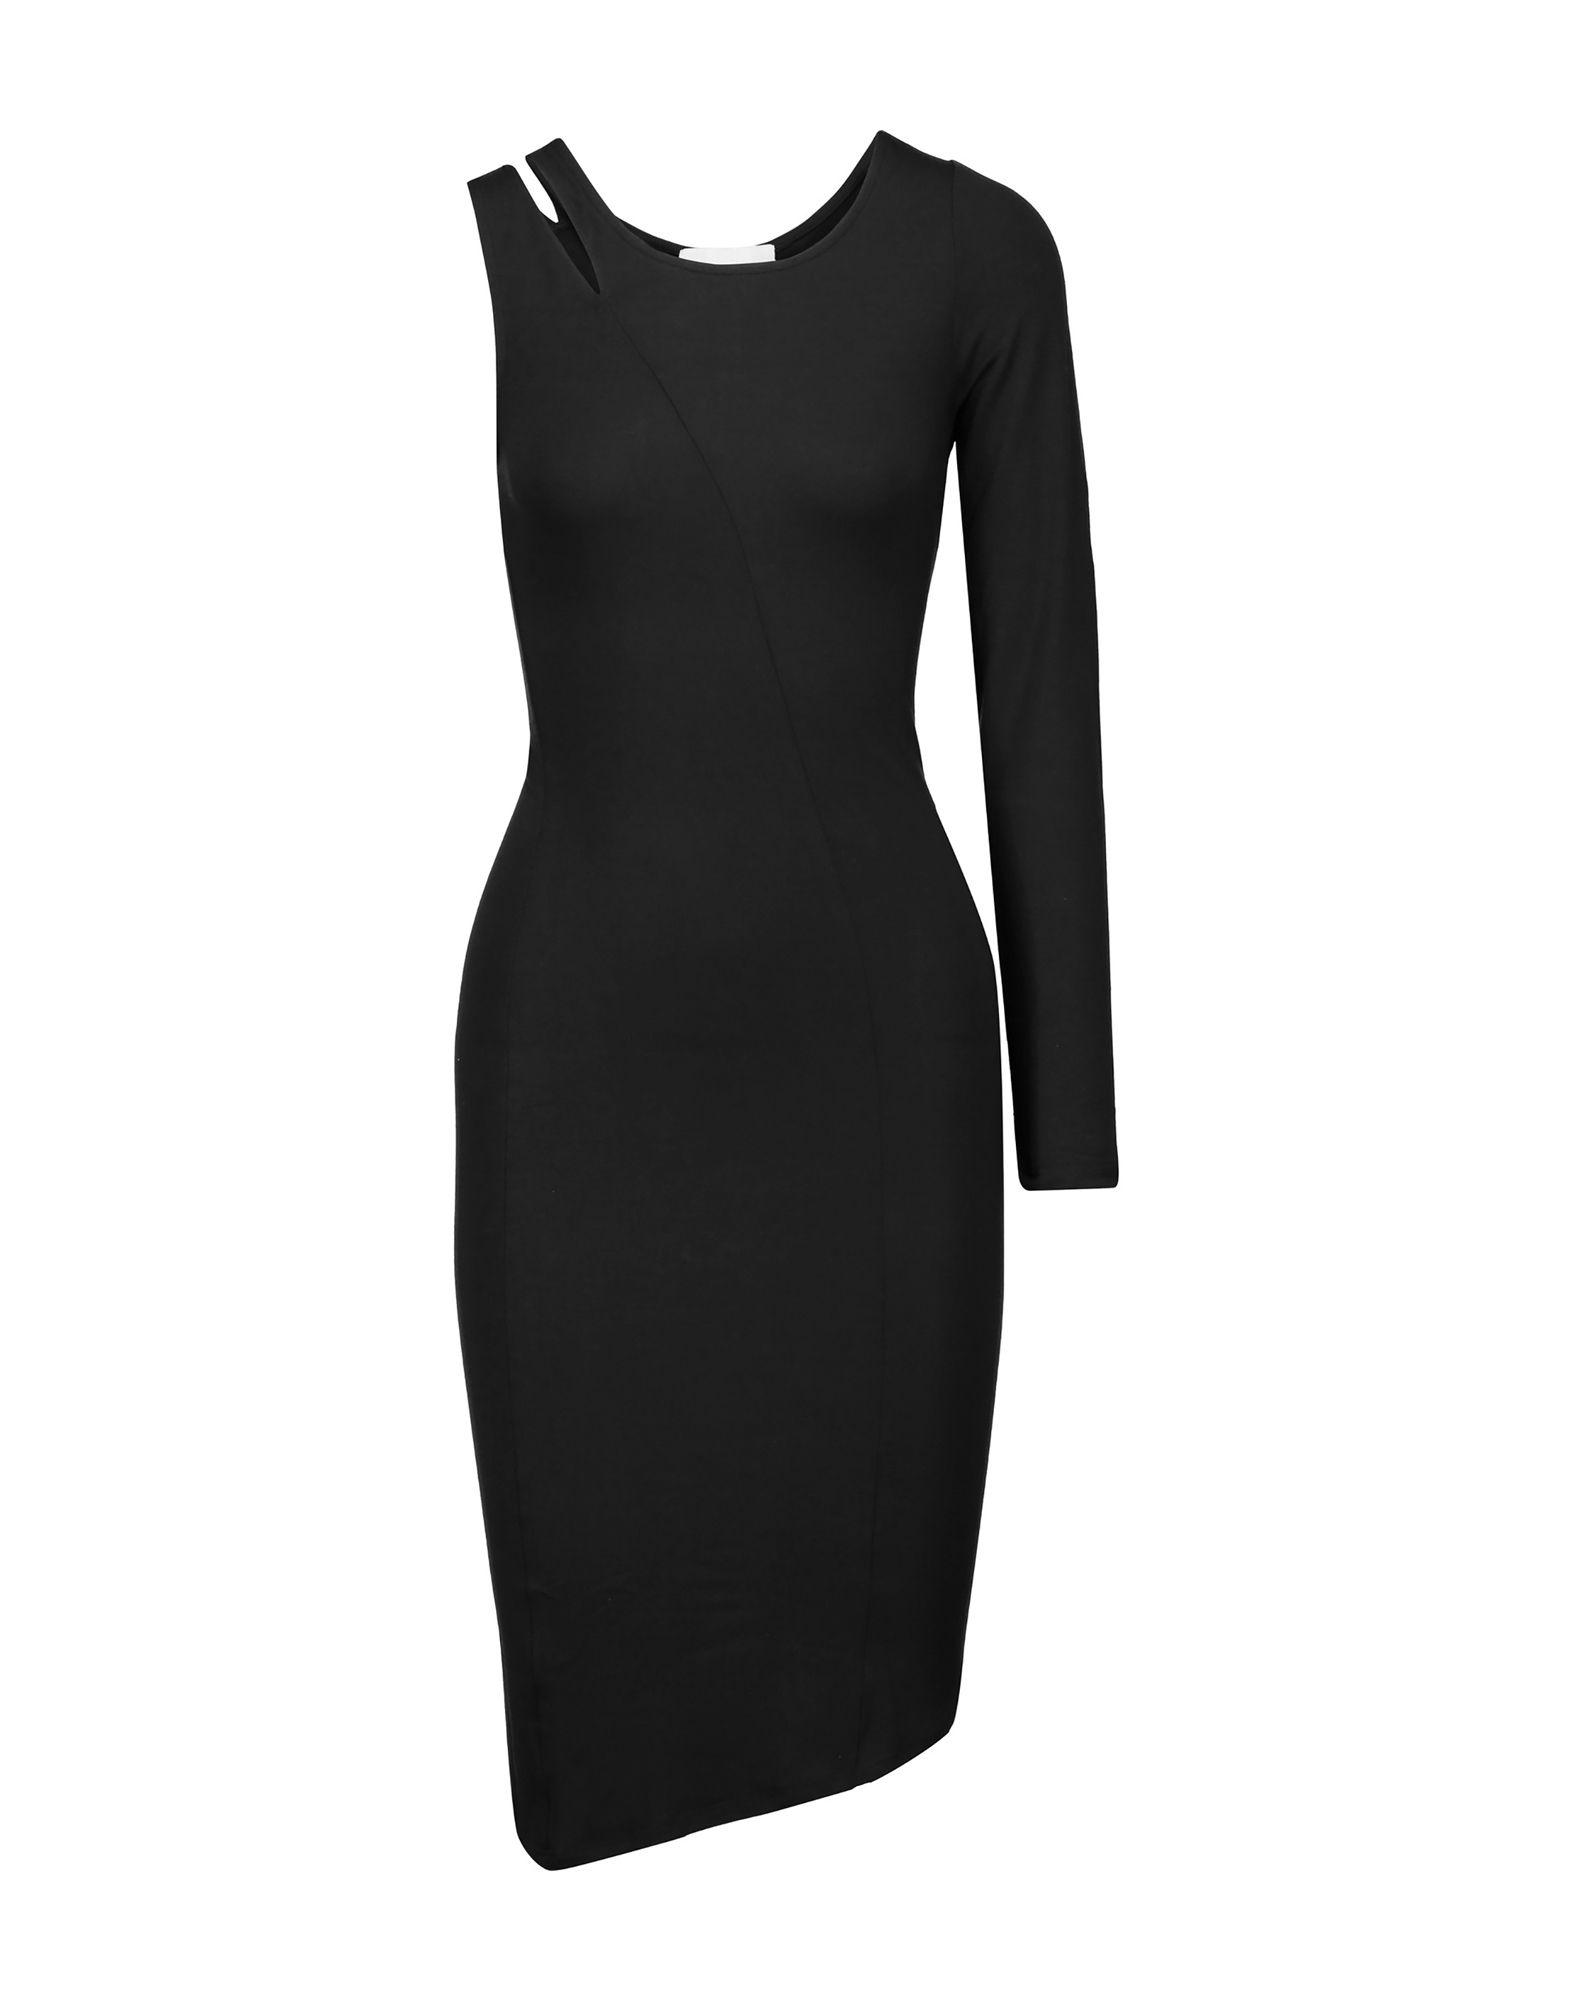 d2038554ba5d Kain Short Dress in Black - Lyst